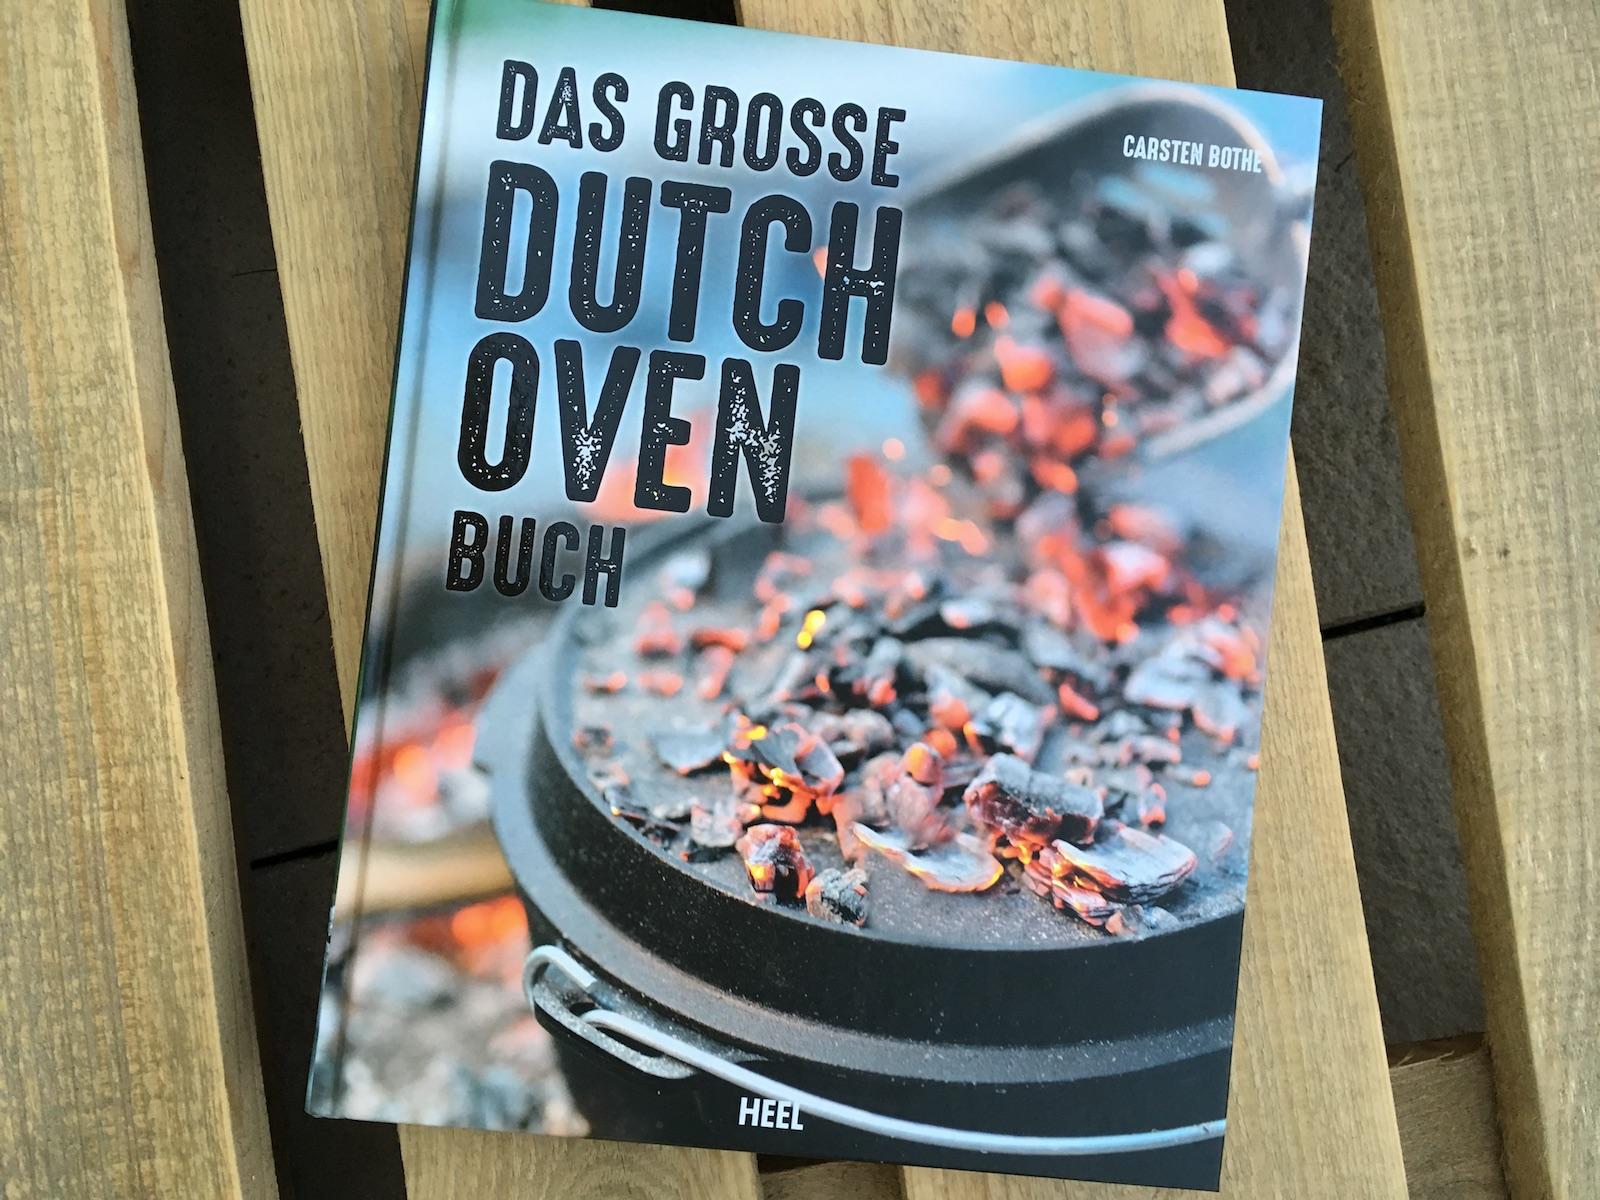 Outdoorküche Buch Buchen : Buchvorstellung das große dutch oven buch matsch piste